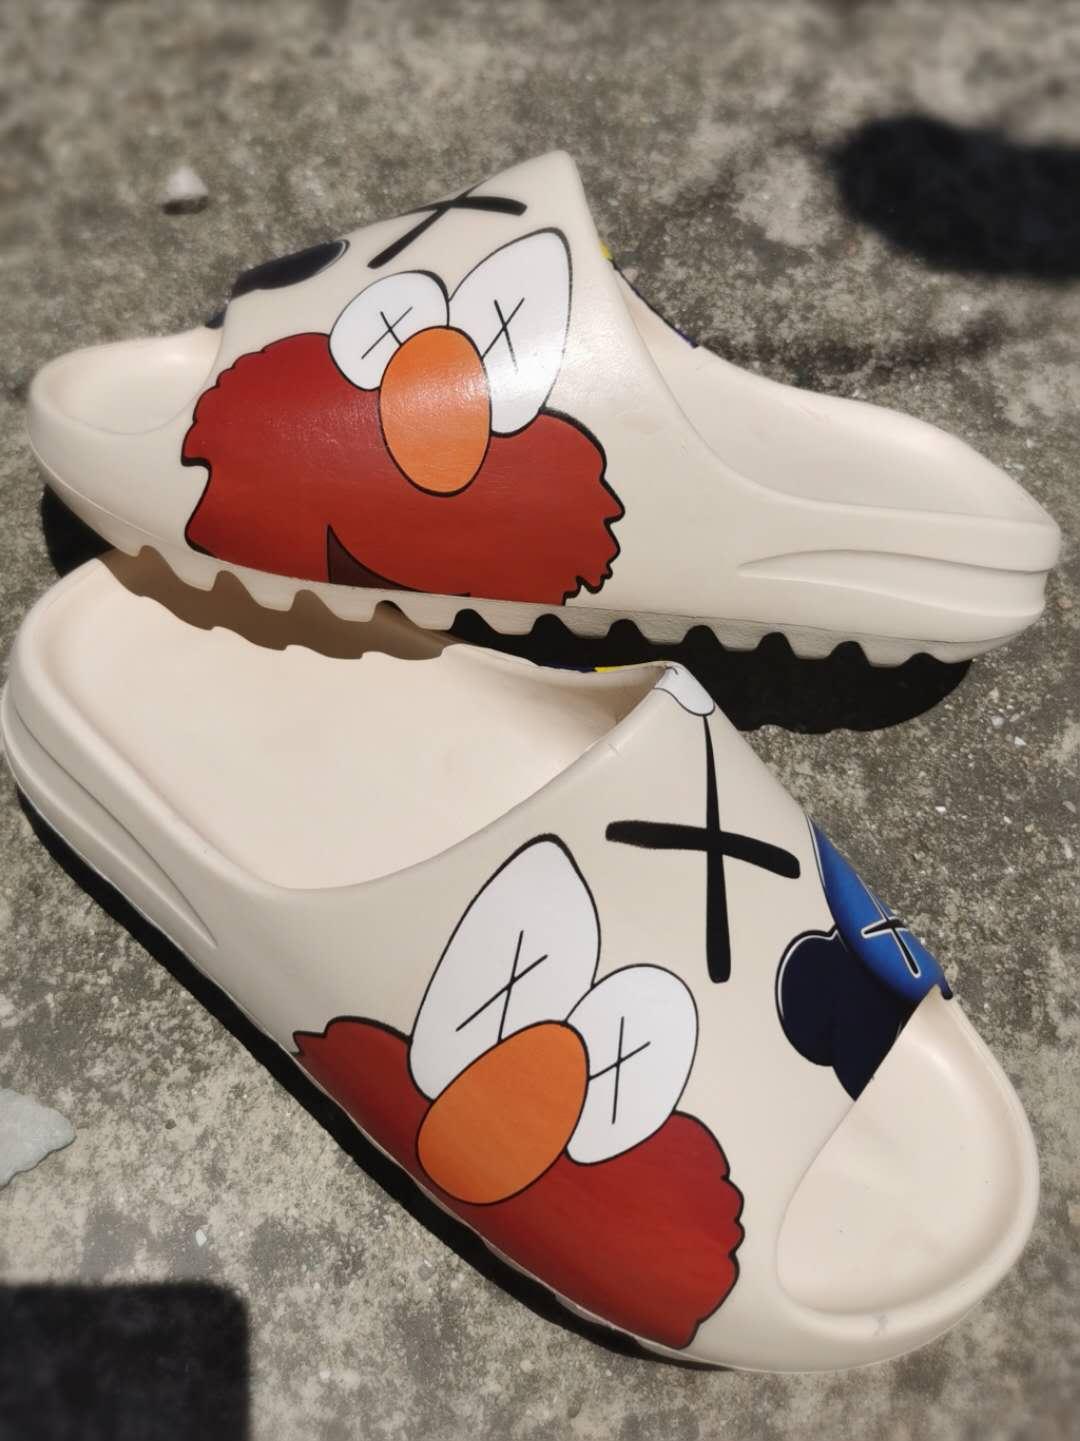 Zapatos planos a la moda para hombre, zapatos informales ligeros, sandalia antideslizante Unisex para parejas, zapatos populares para hombre con ondas súper calientes